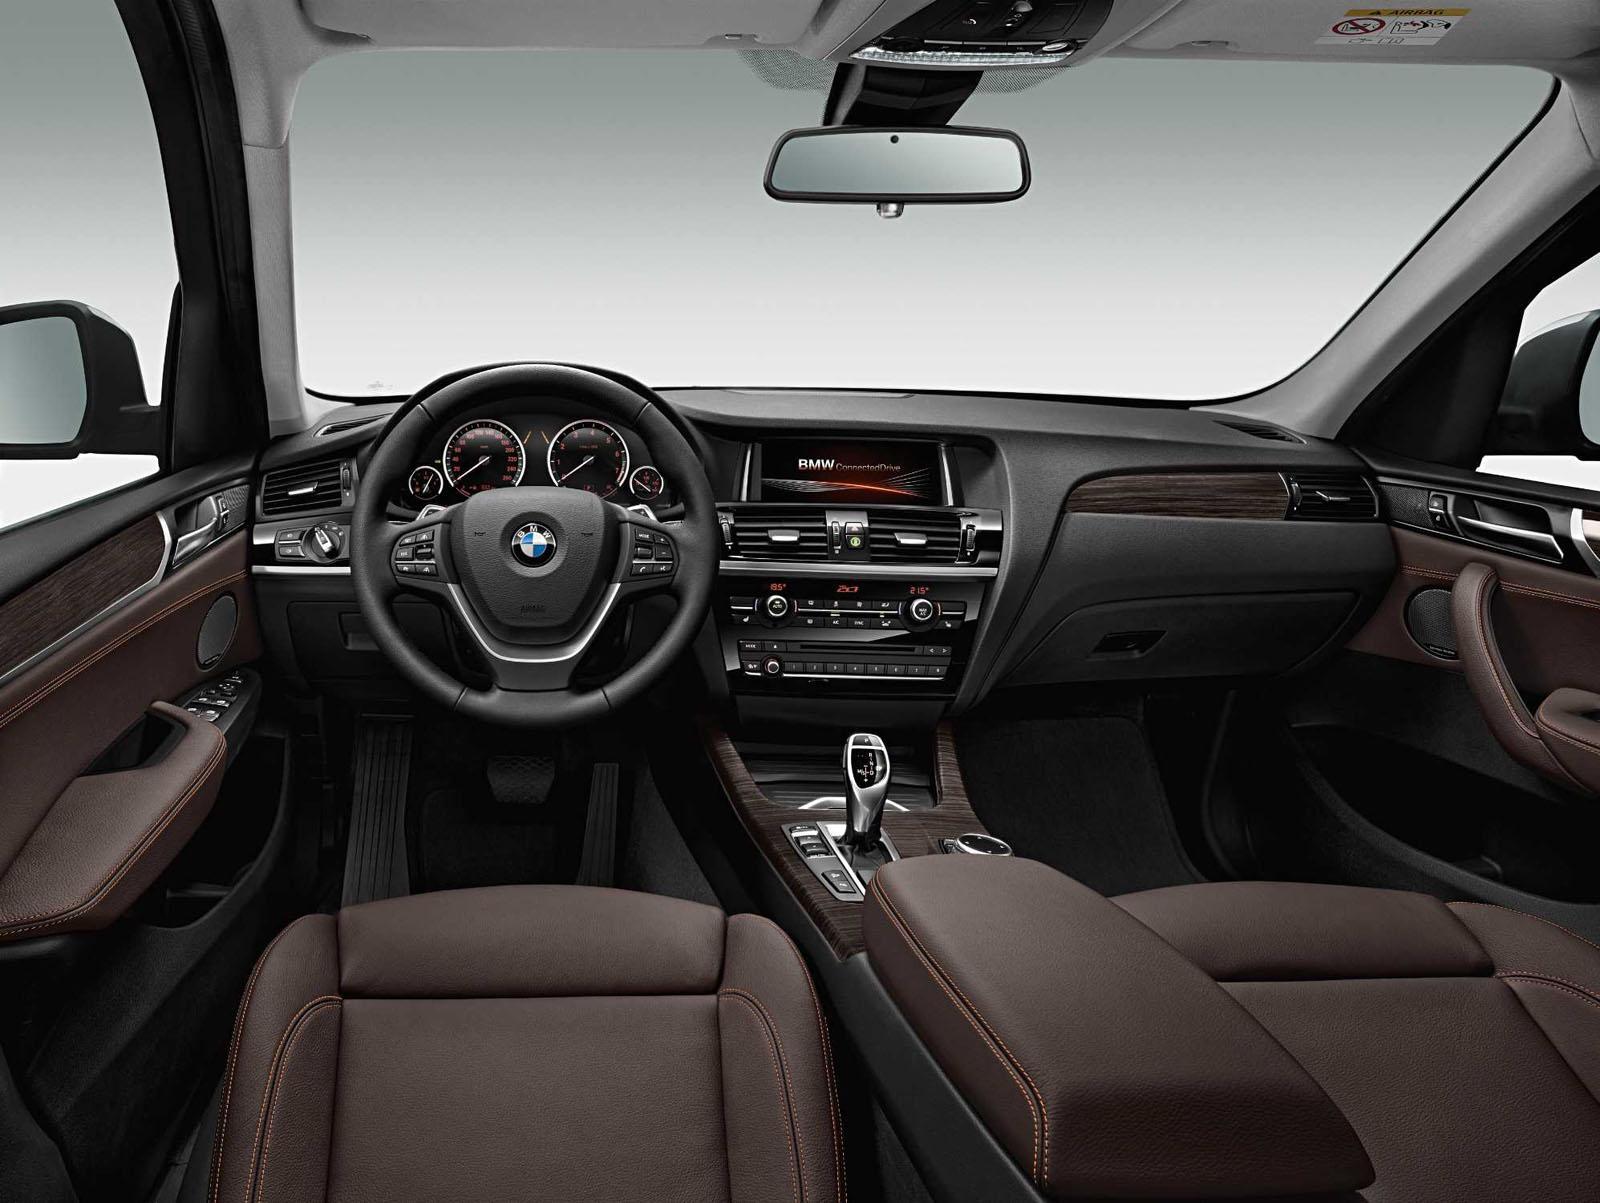 2015 BMW X3 facelift press shot interior